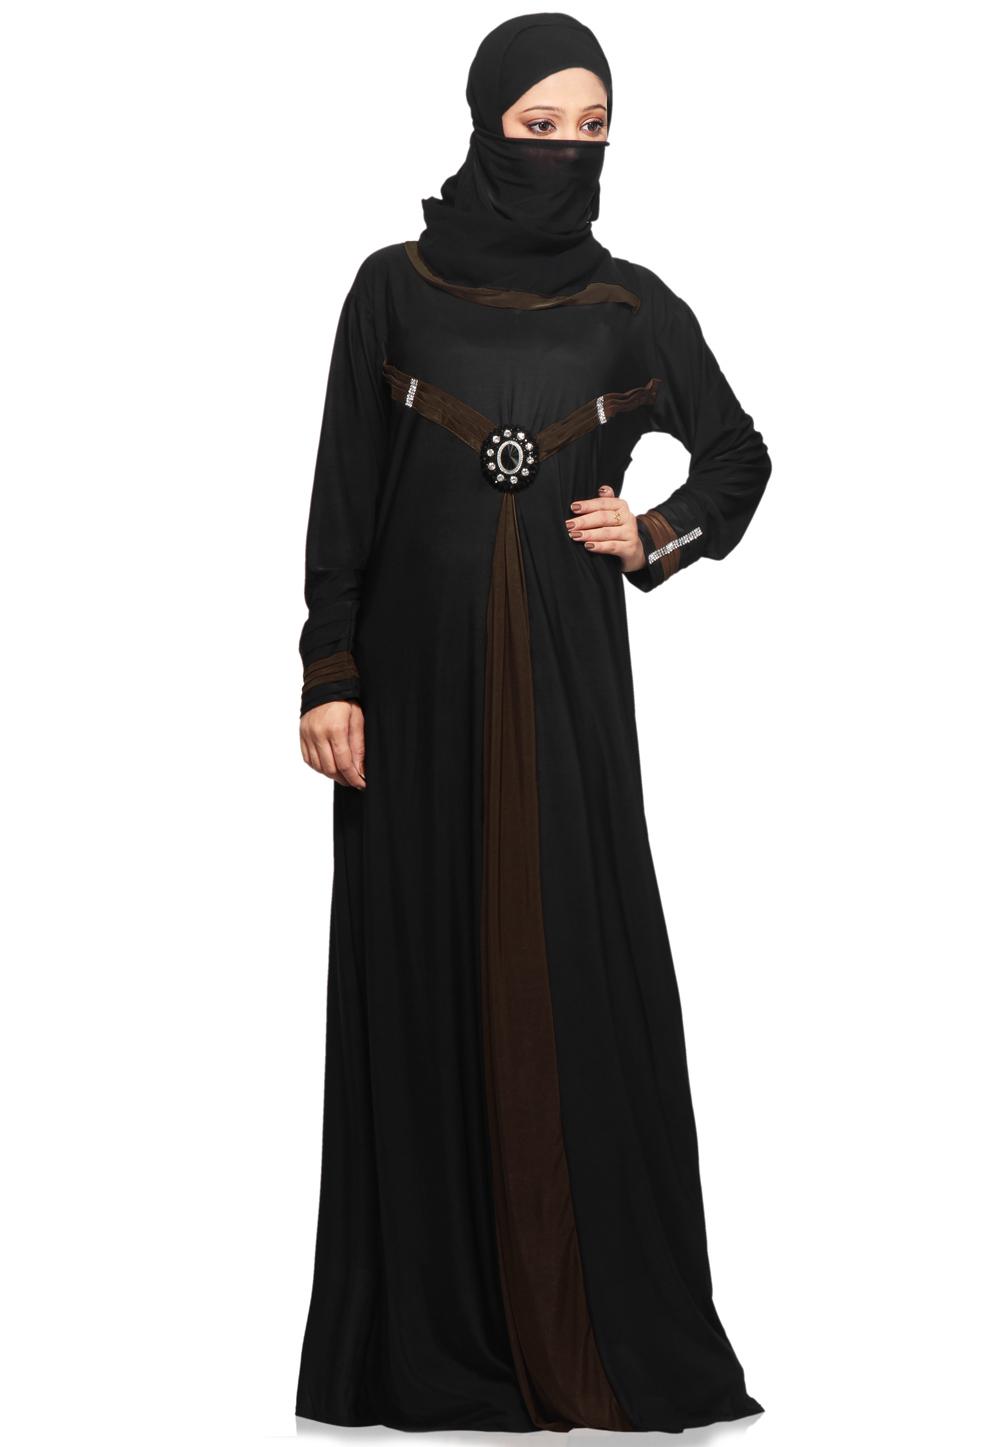 New Burka Design